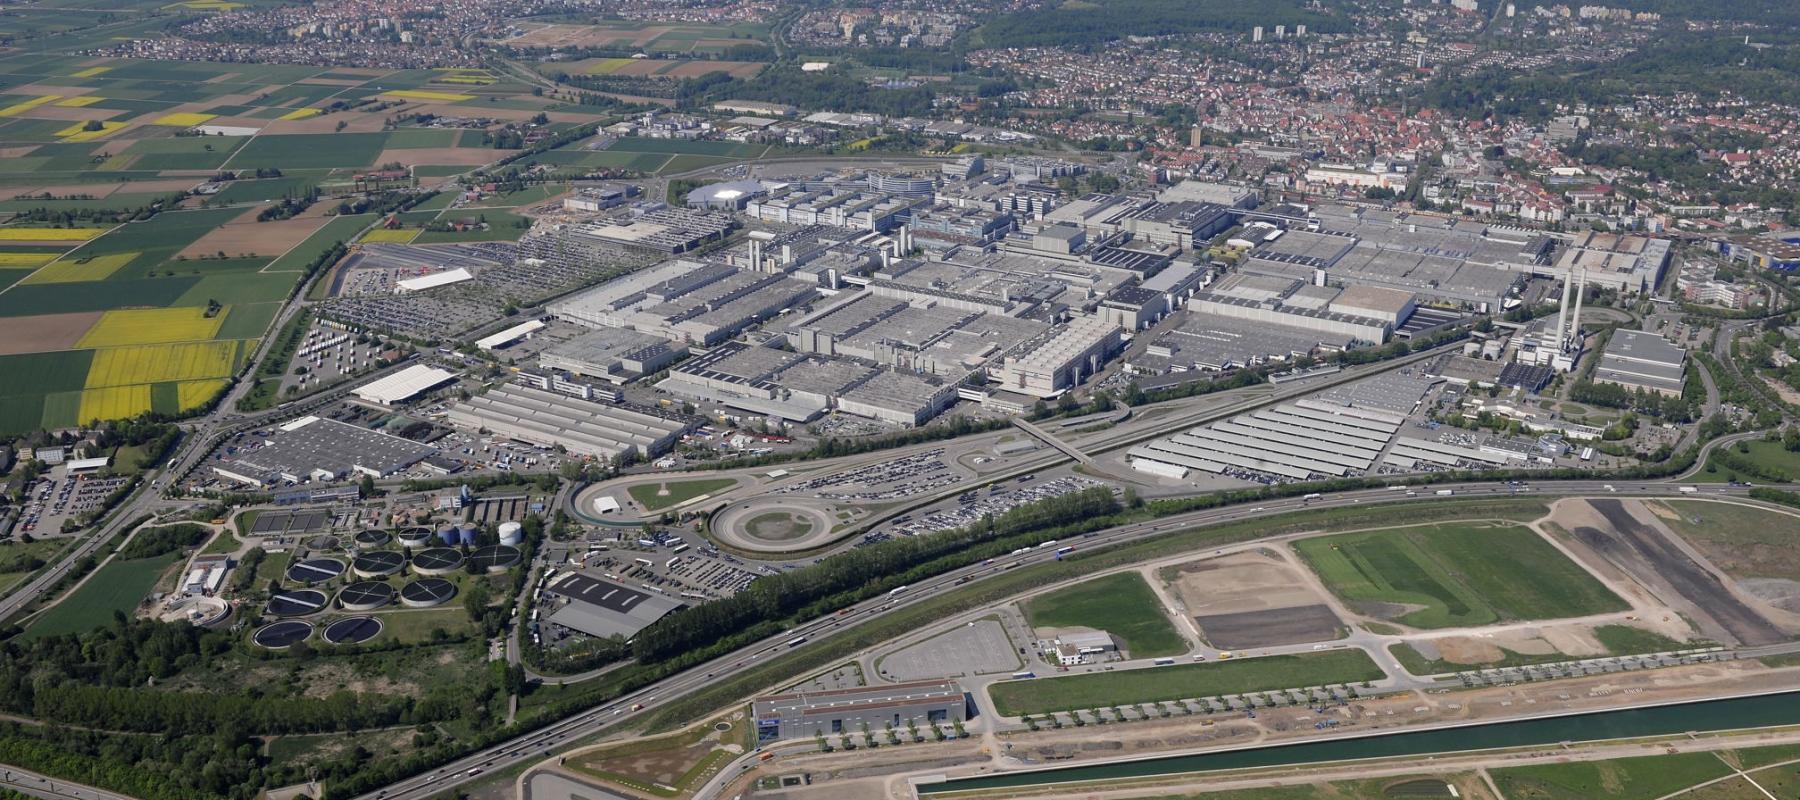 More than 22,000 people work at the Mercedes-Benz plant in Sindelfingen, Germany. It is the biggest production facility of Daimler AG worldwide. // Das Mercedes-Benz Werk Sindelfingen ist mit mehr als 22.000 Mitarbeitern das größte Produktionswerk der Daimler AG weltweit.